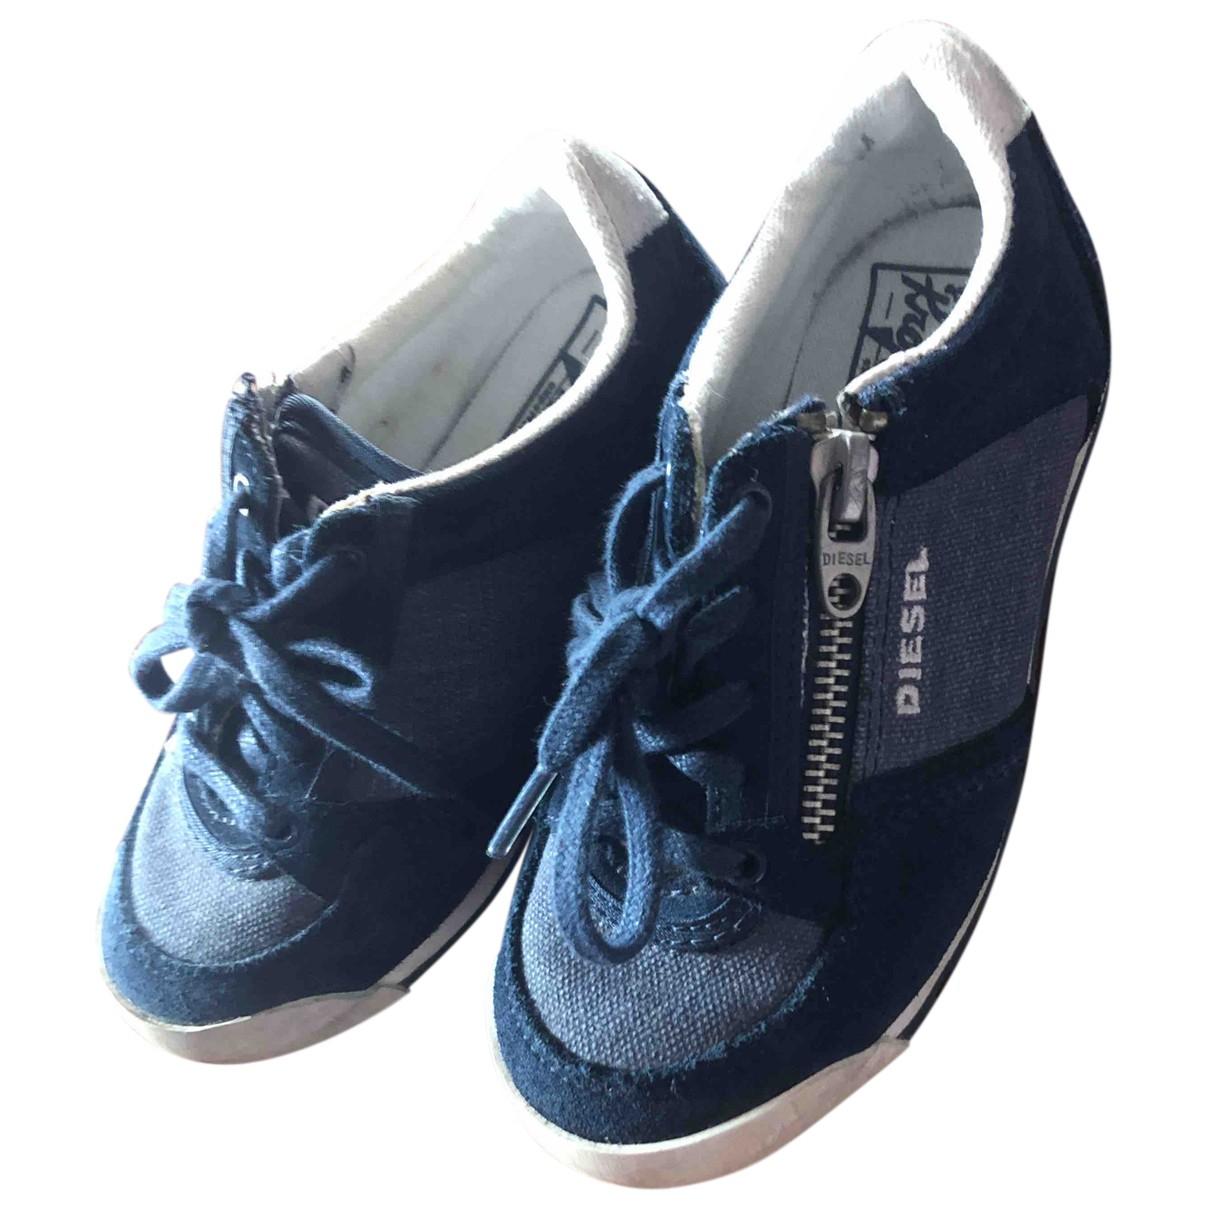 Diesel N Blue Cloth Trainers for Kids 25 FR